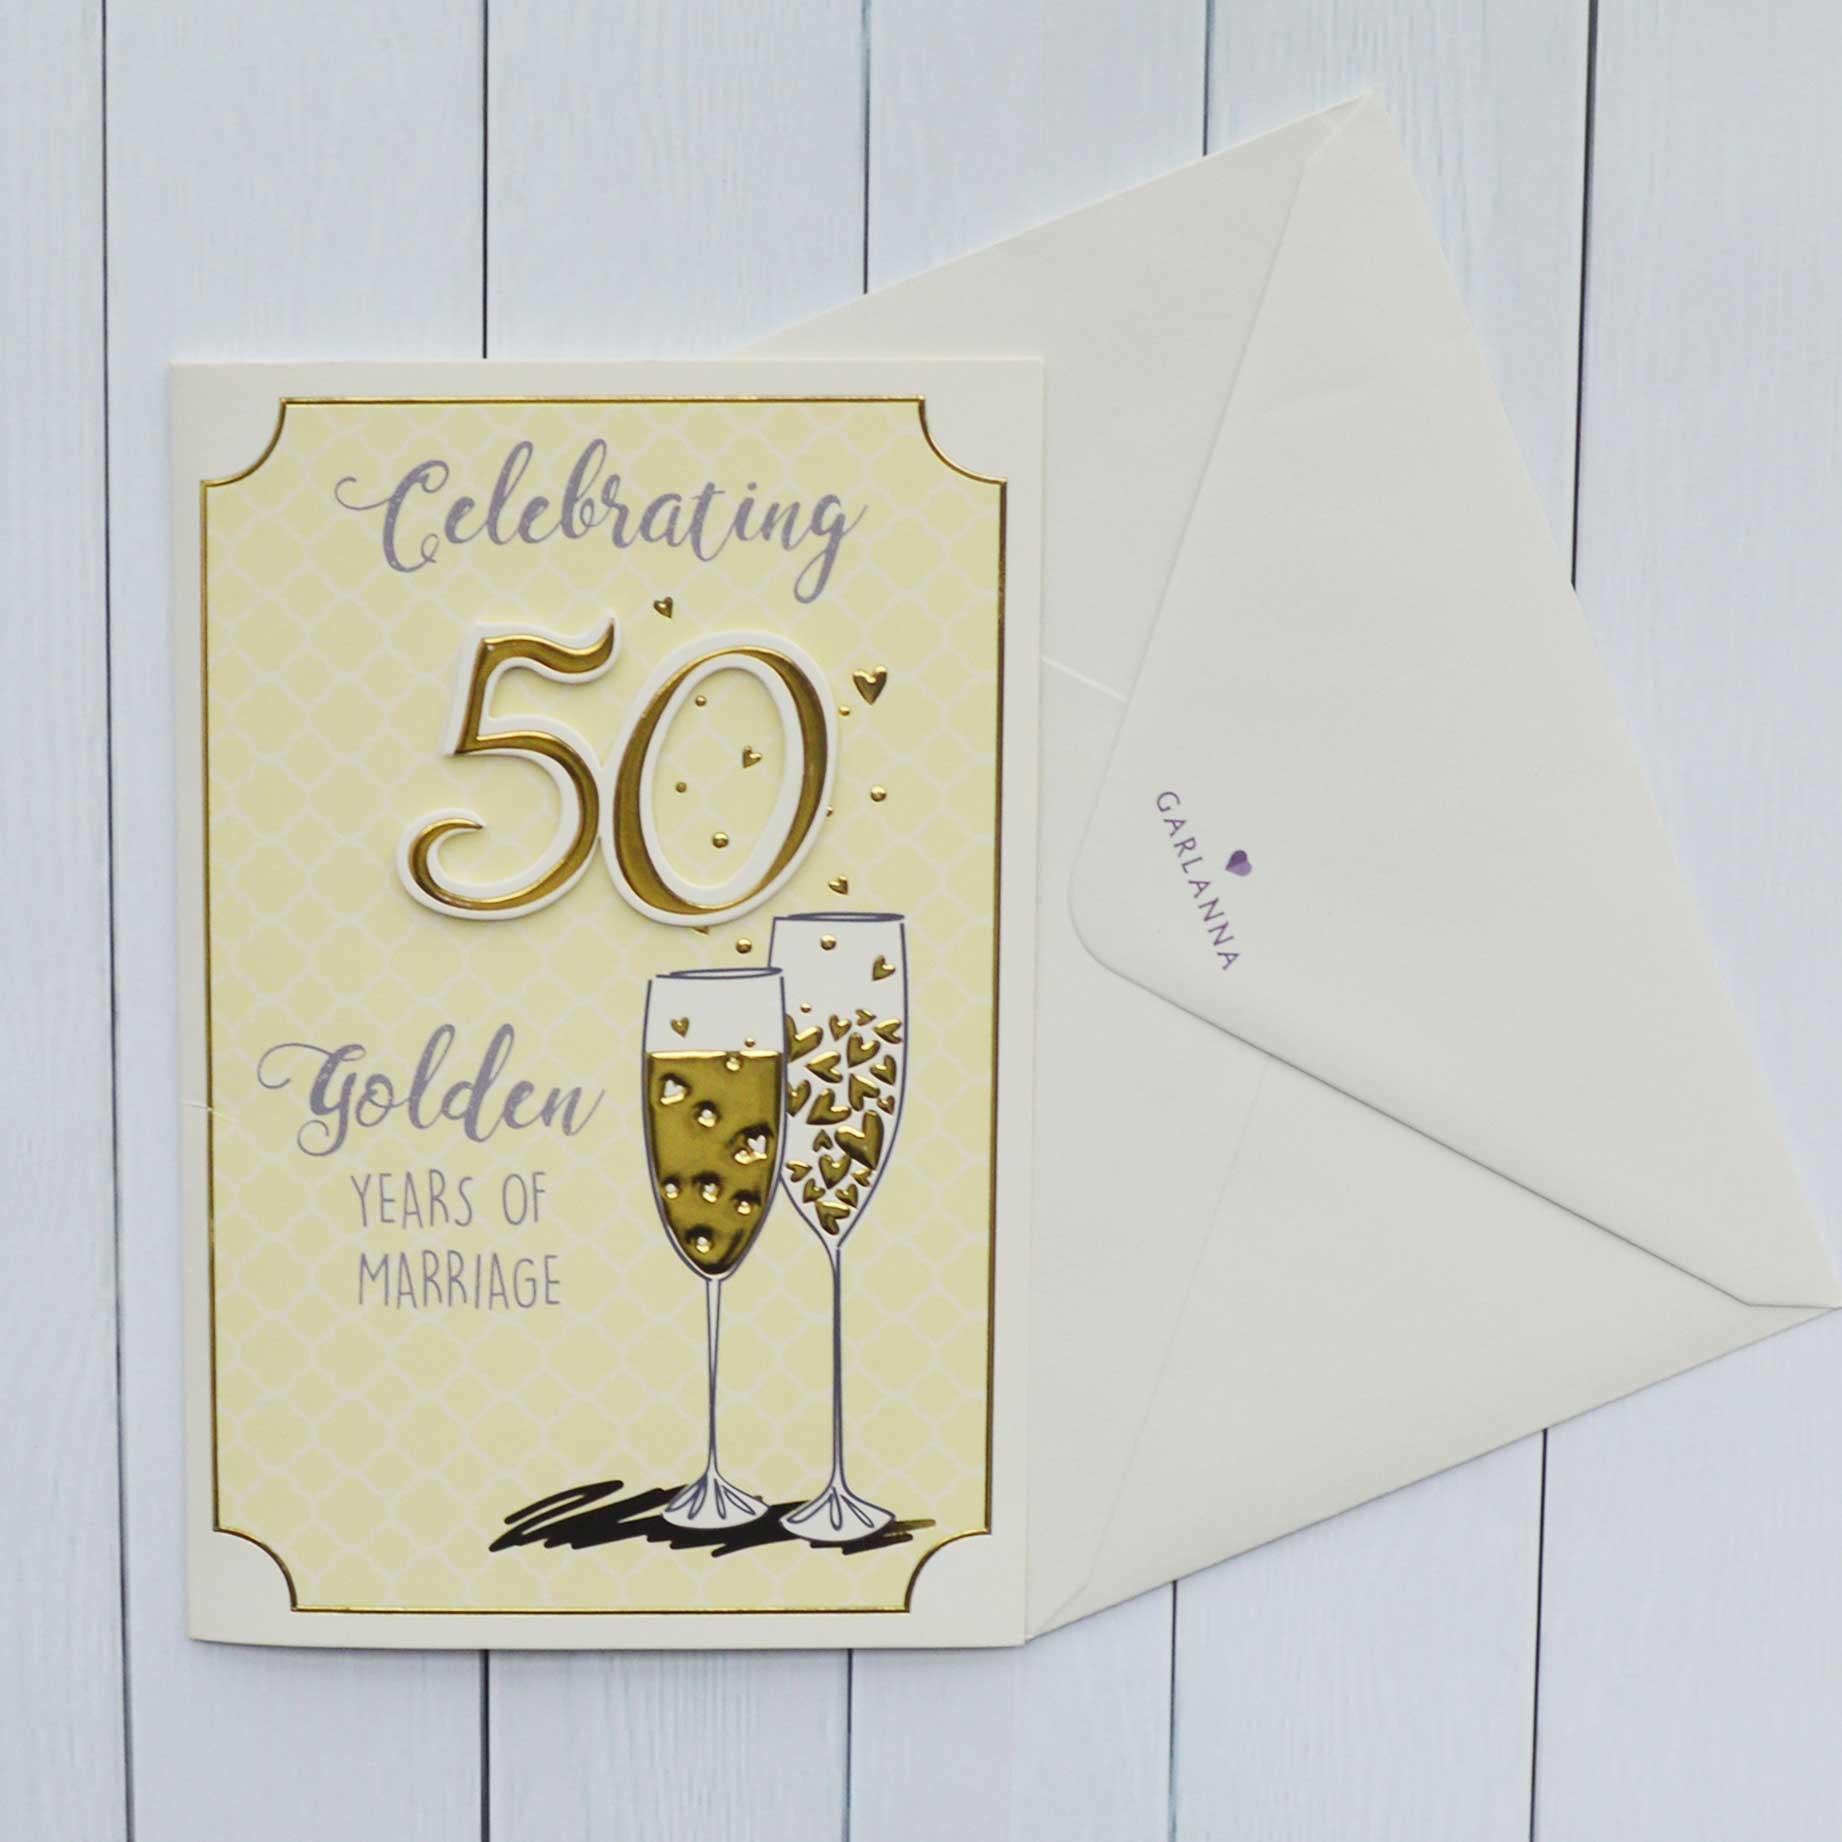 anniversary card golden wedding 50 years  garlanna